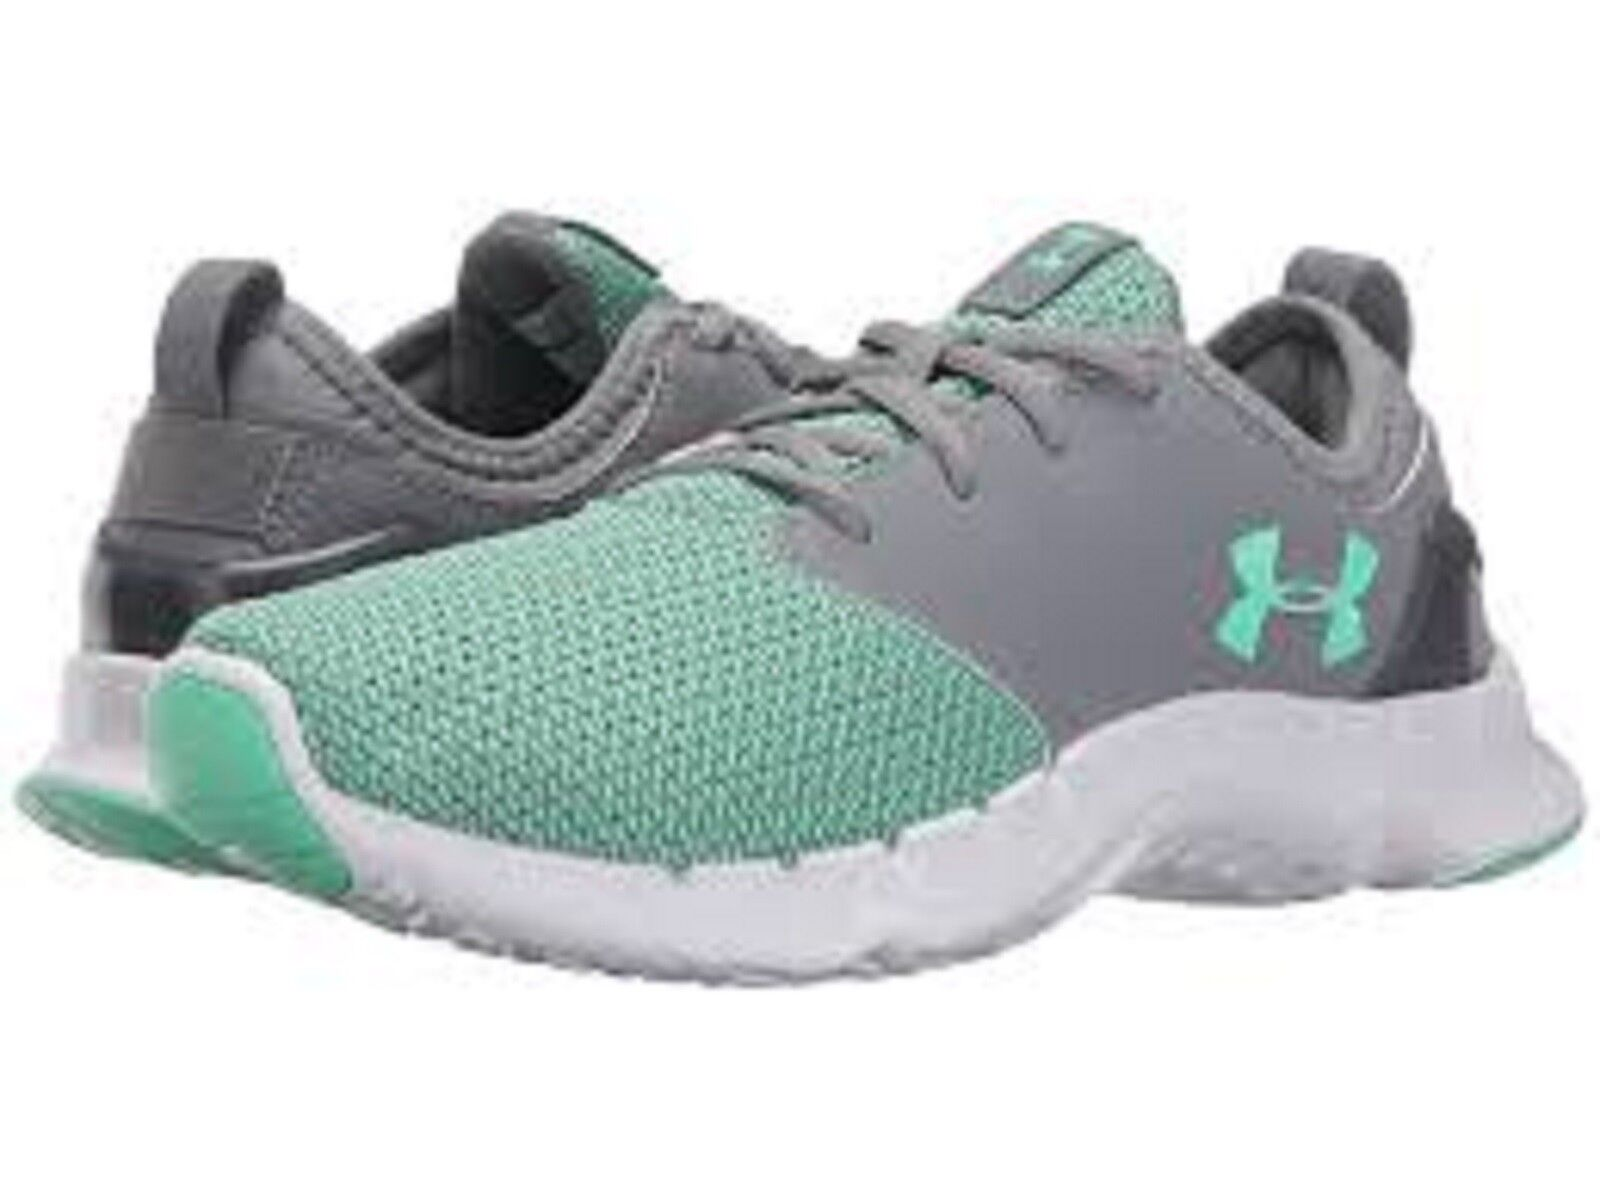 UNDER ARMOUR Ladies 'FLOW SOLID' Running Shoe-Lt Green/ gris / blanc Sz. 9 M NIB